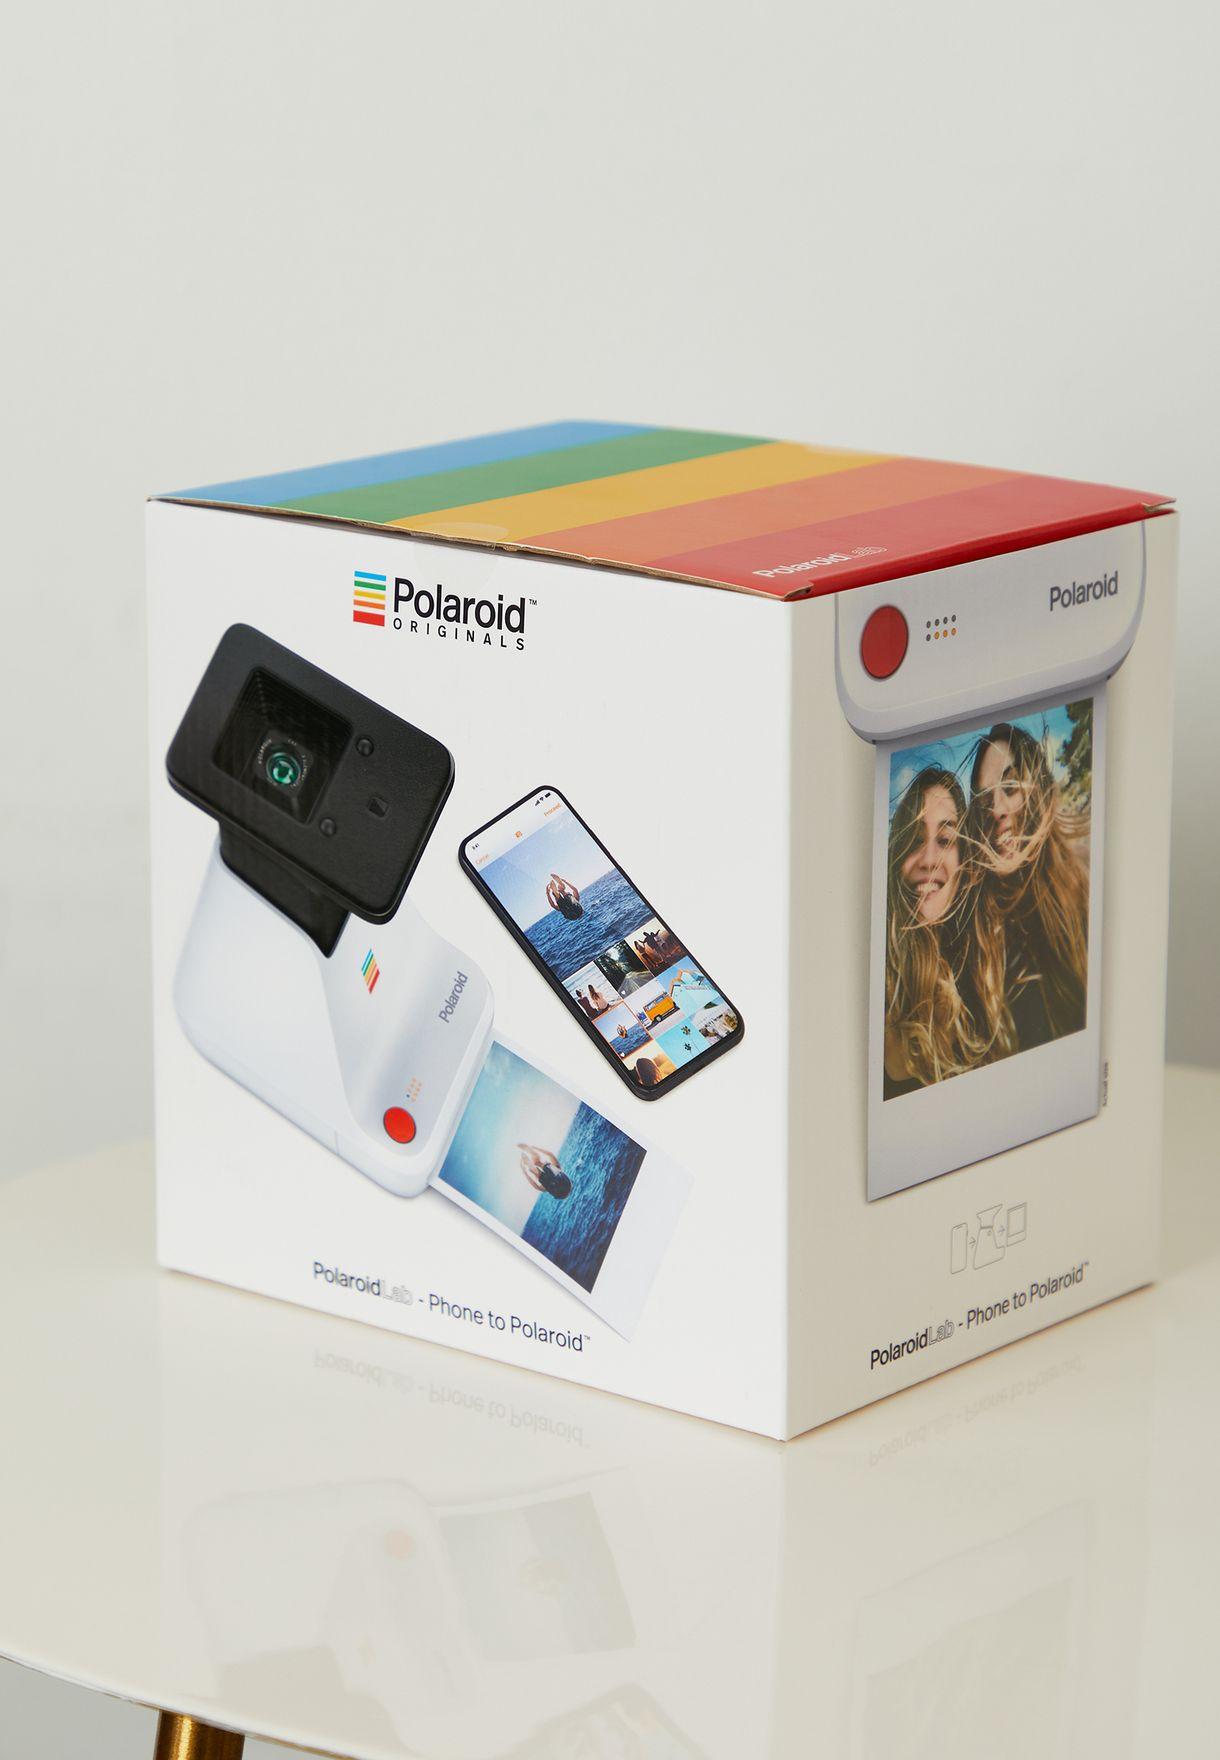 The Polaroid Original Lab - Digital To Analog Phot